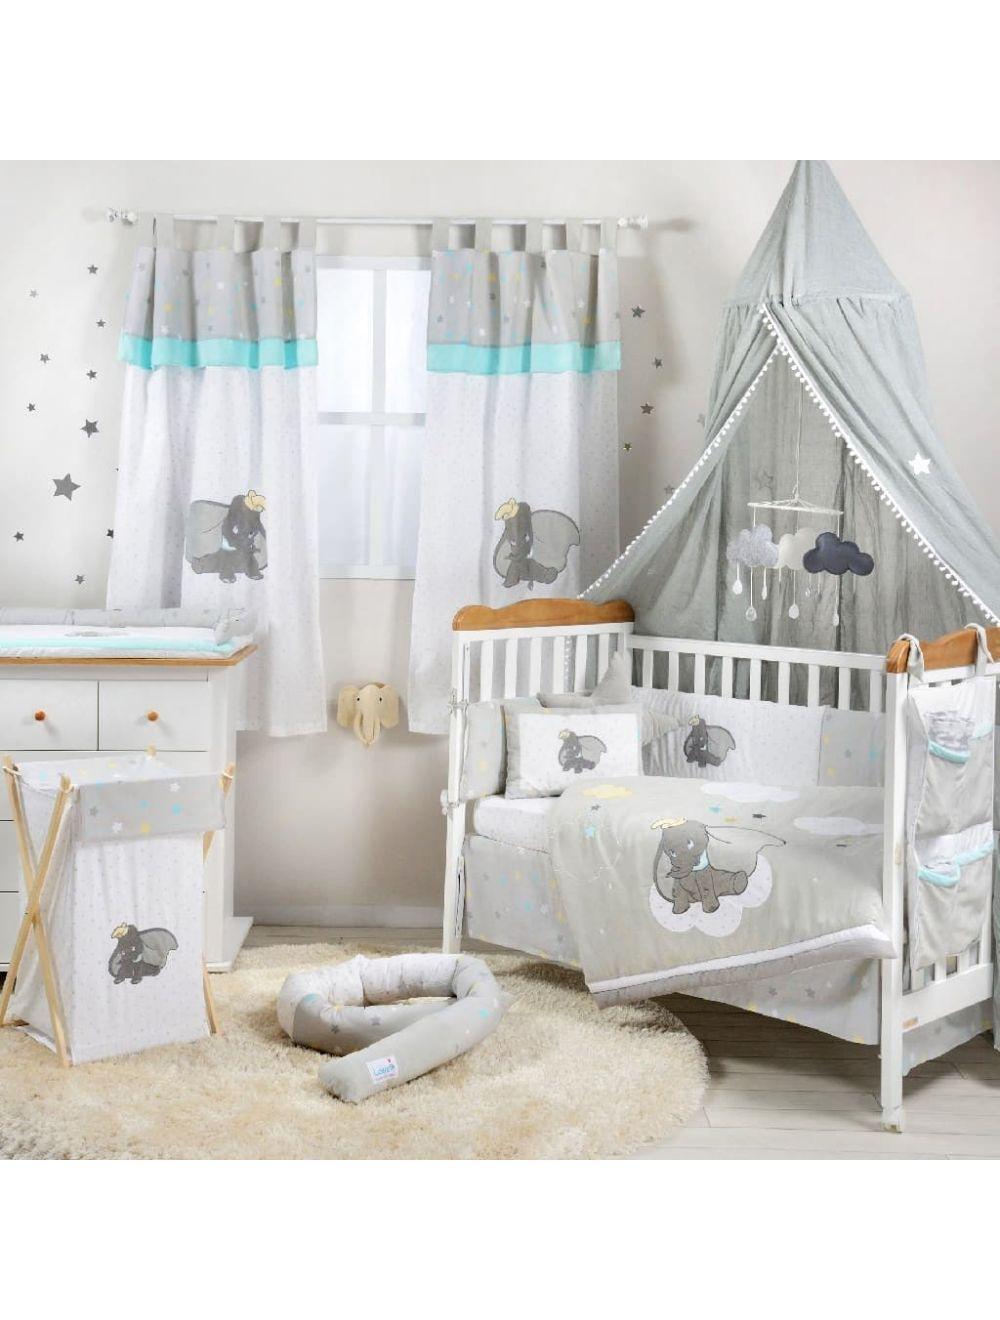 Dumbo Crib Bedding Collection Baby Crib Bedding Set Crib Bedding